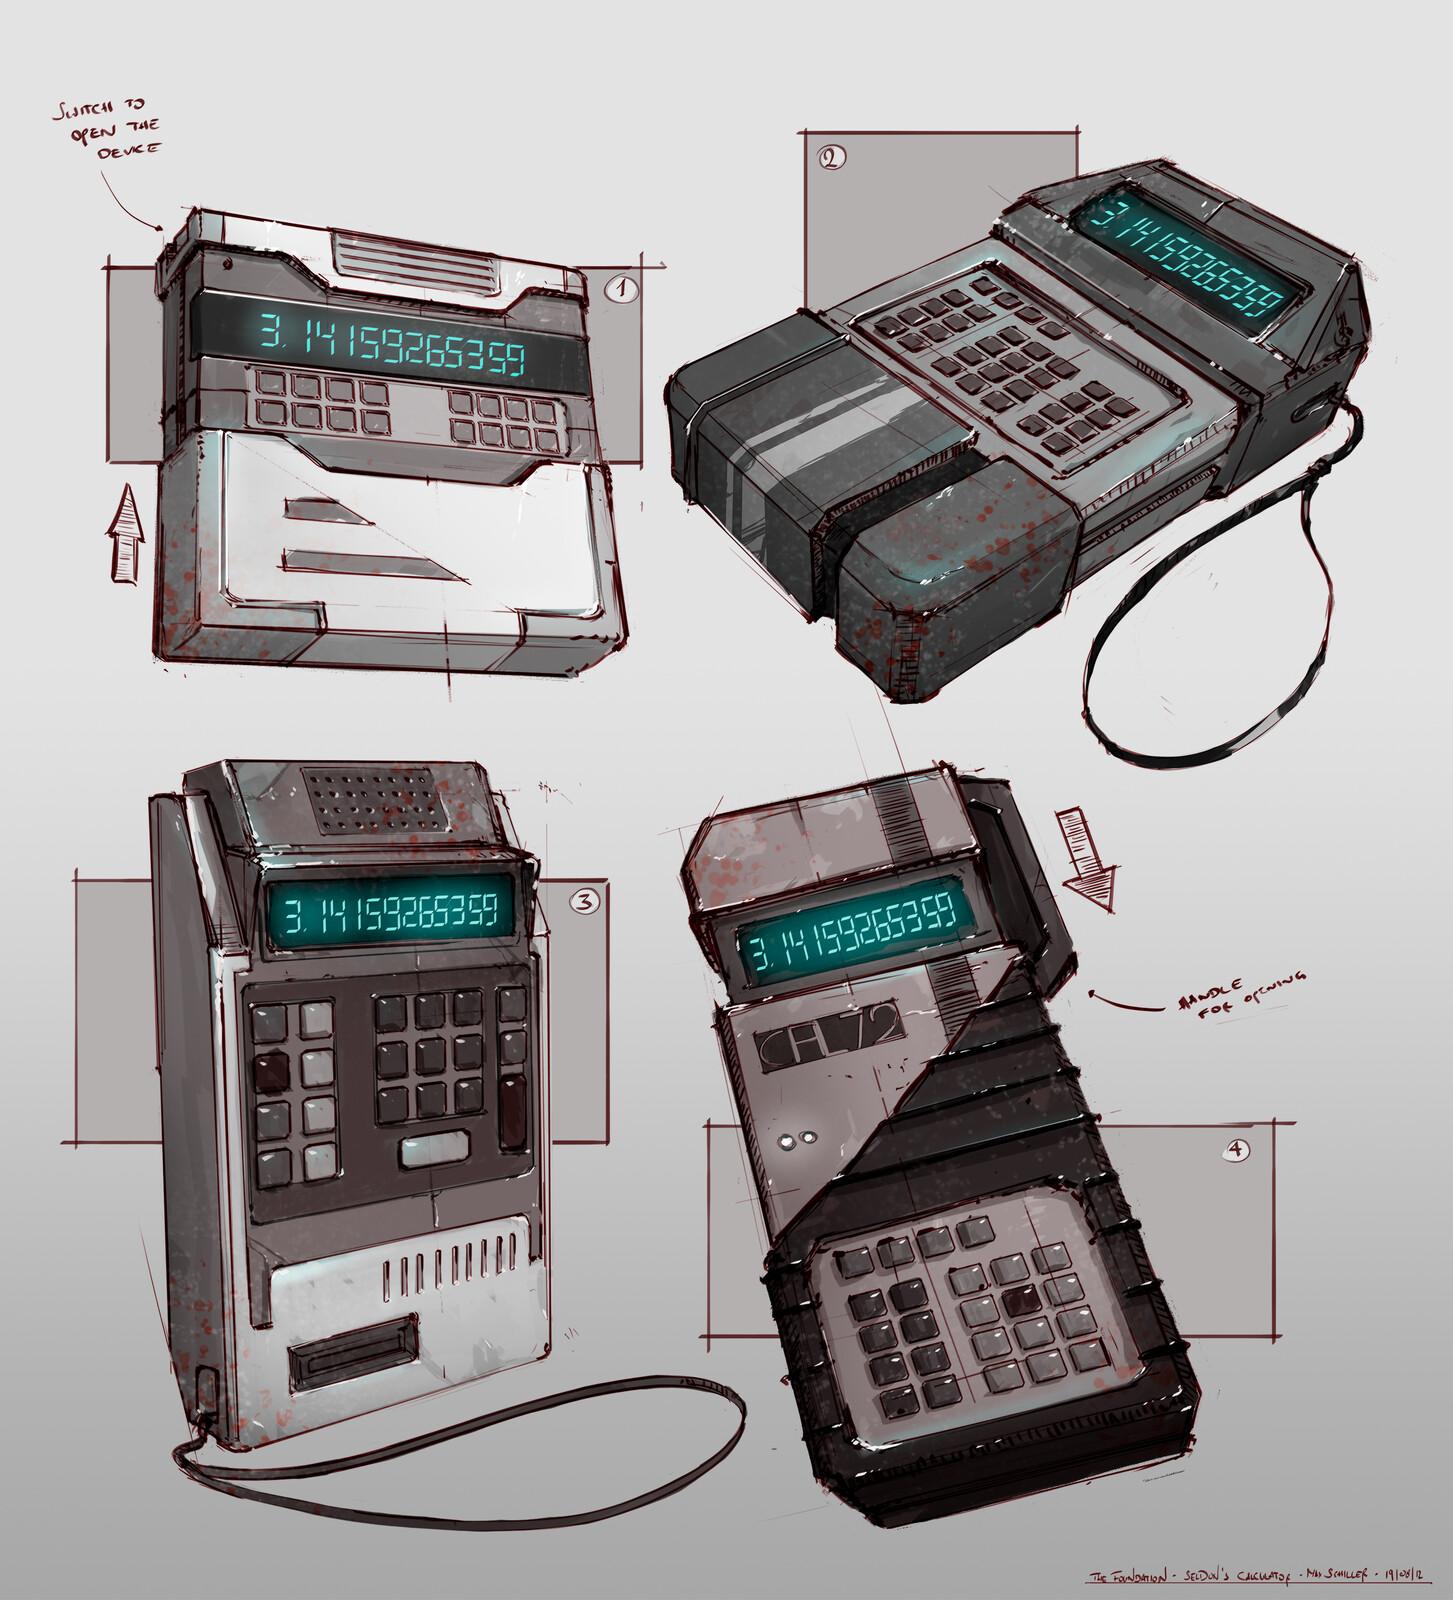 Seldon's Calculator - Concept Design